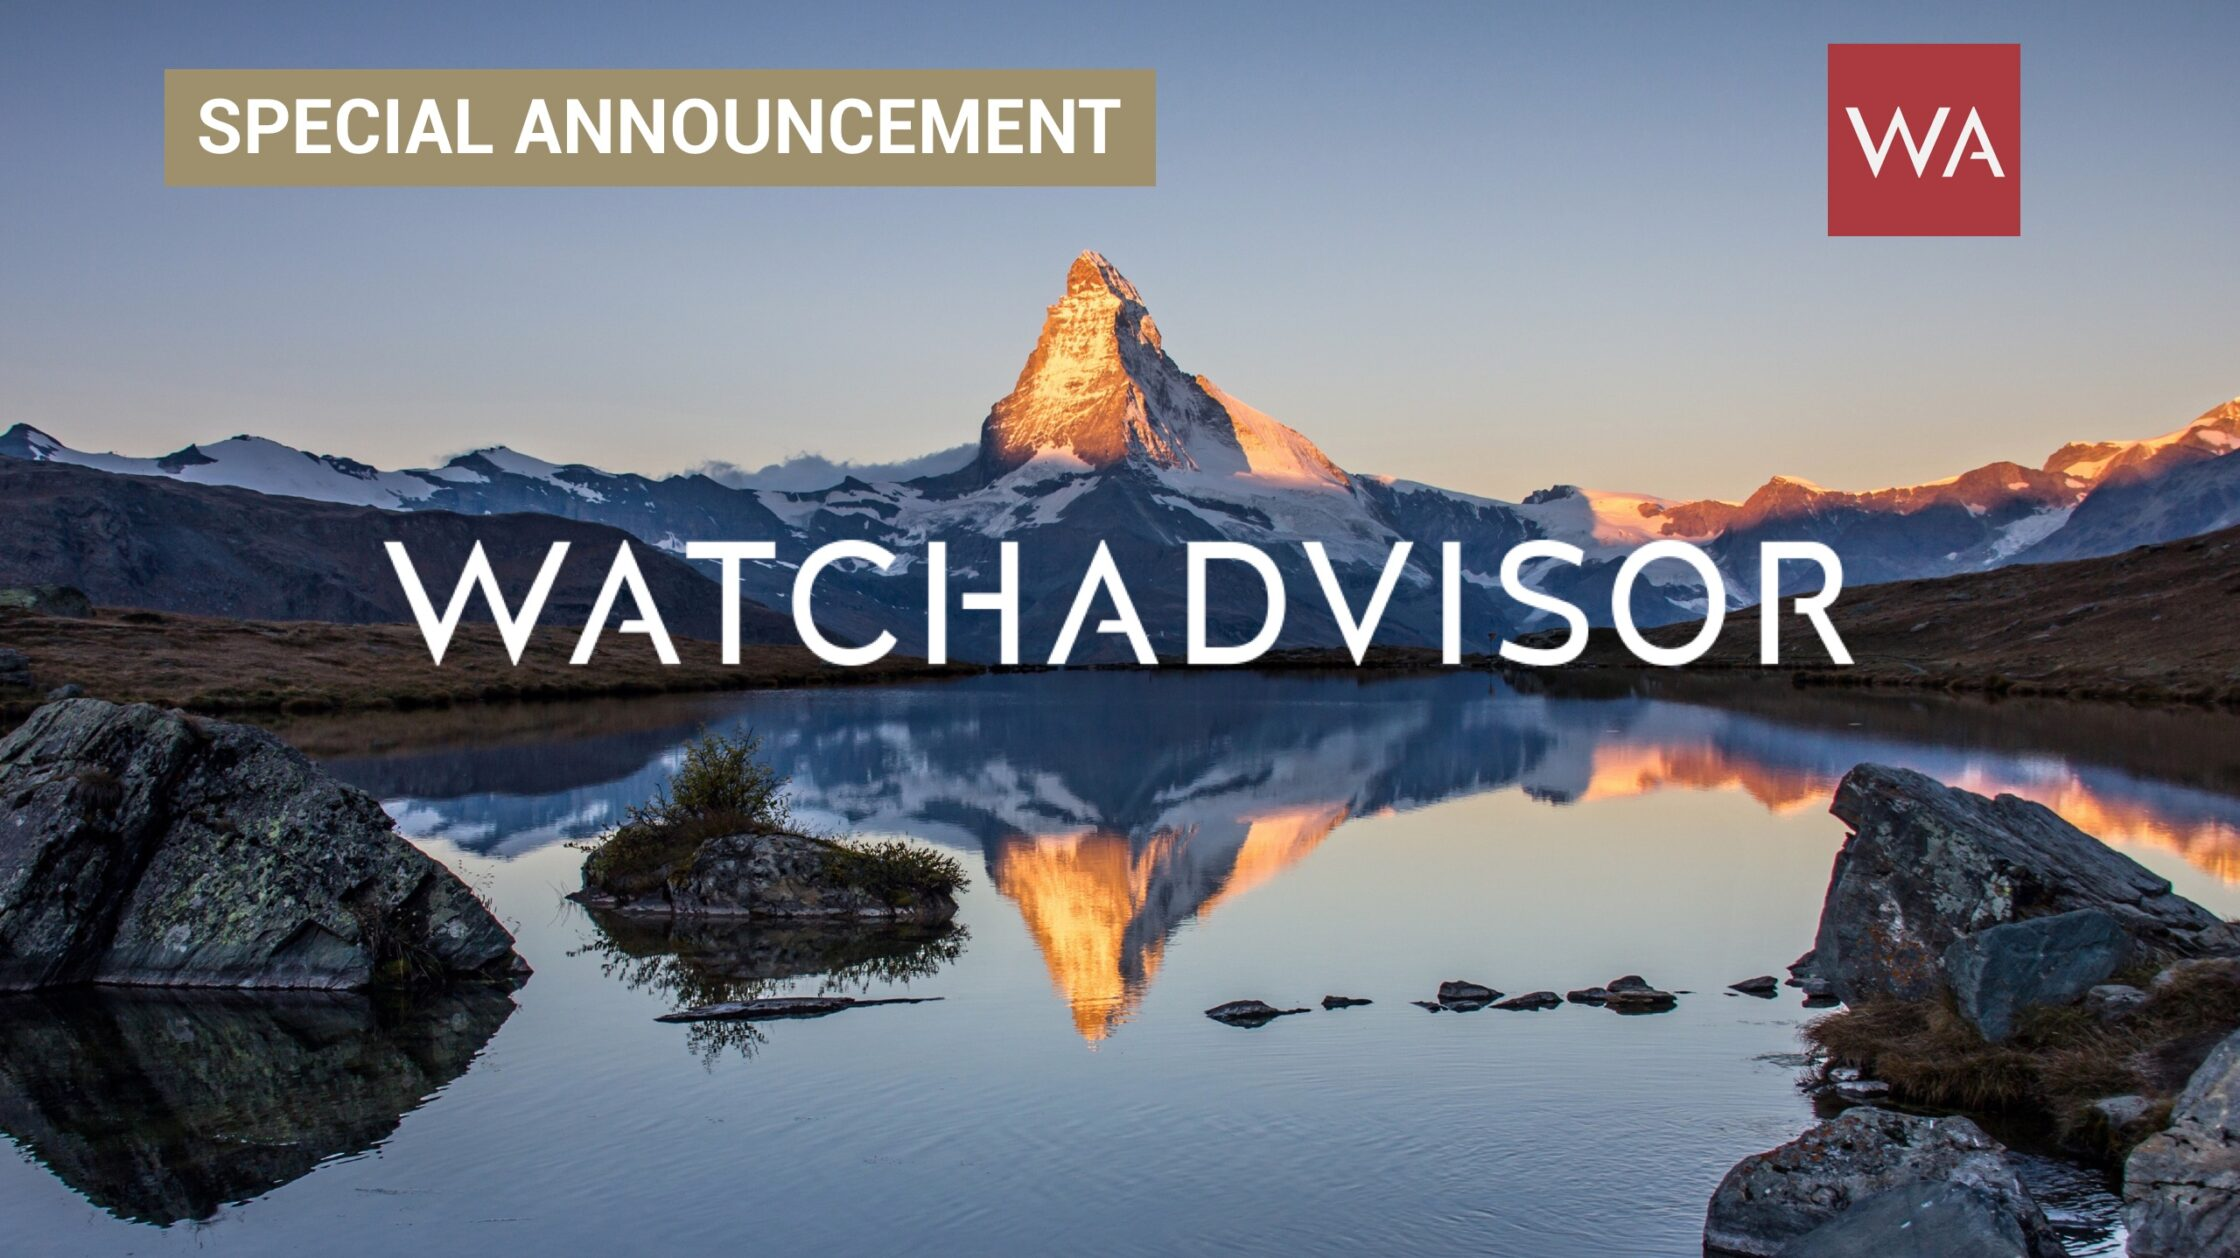 WatchAdvisor Special Announcement